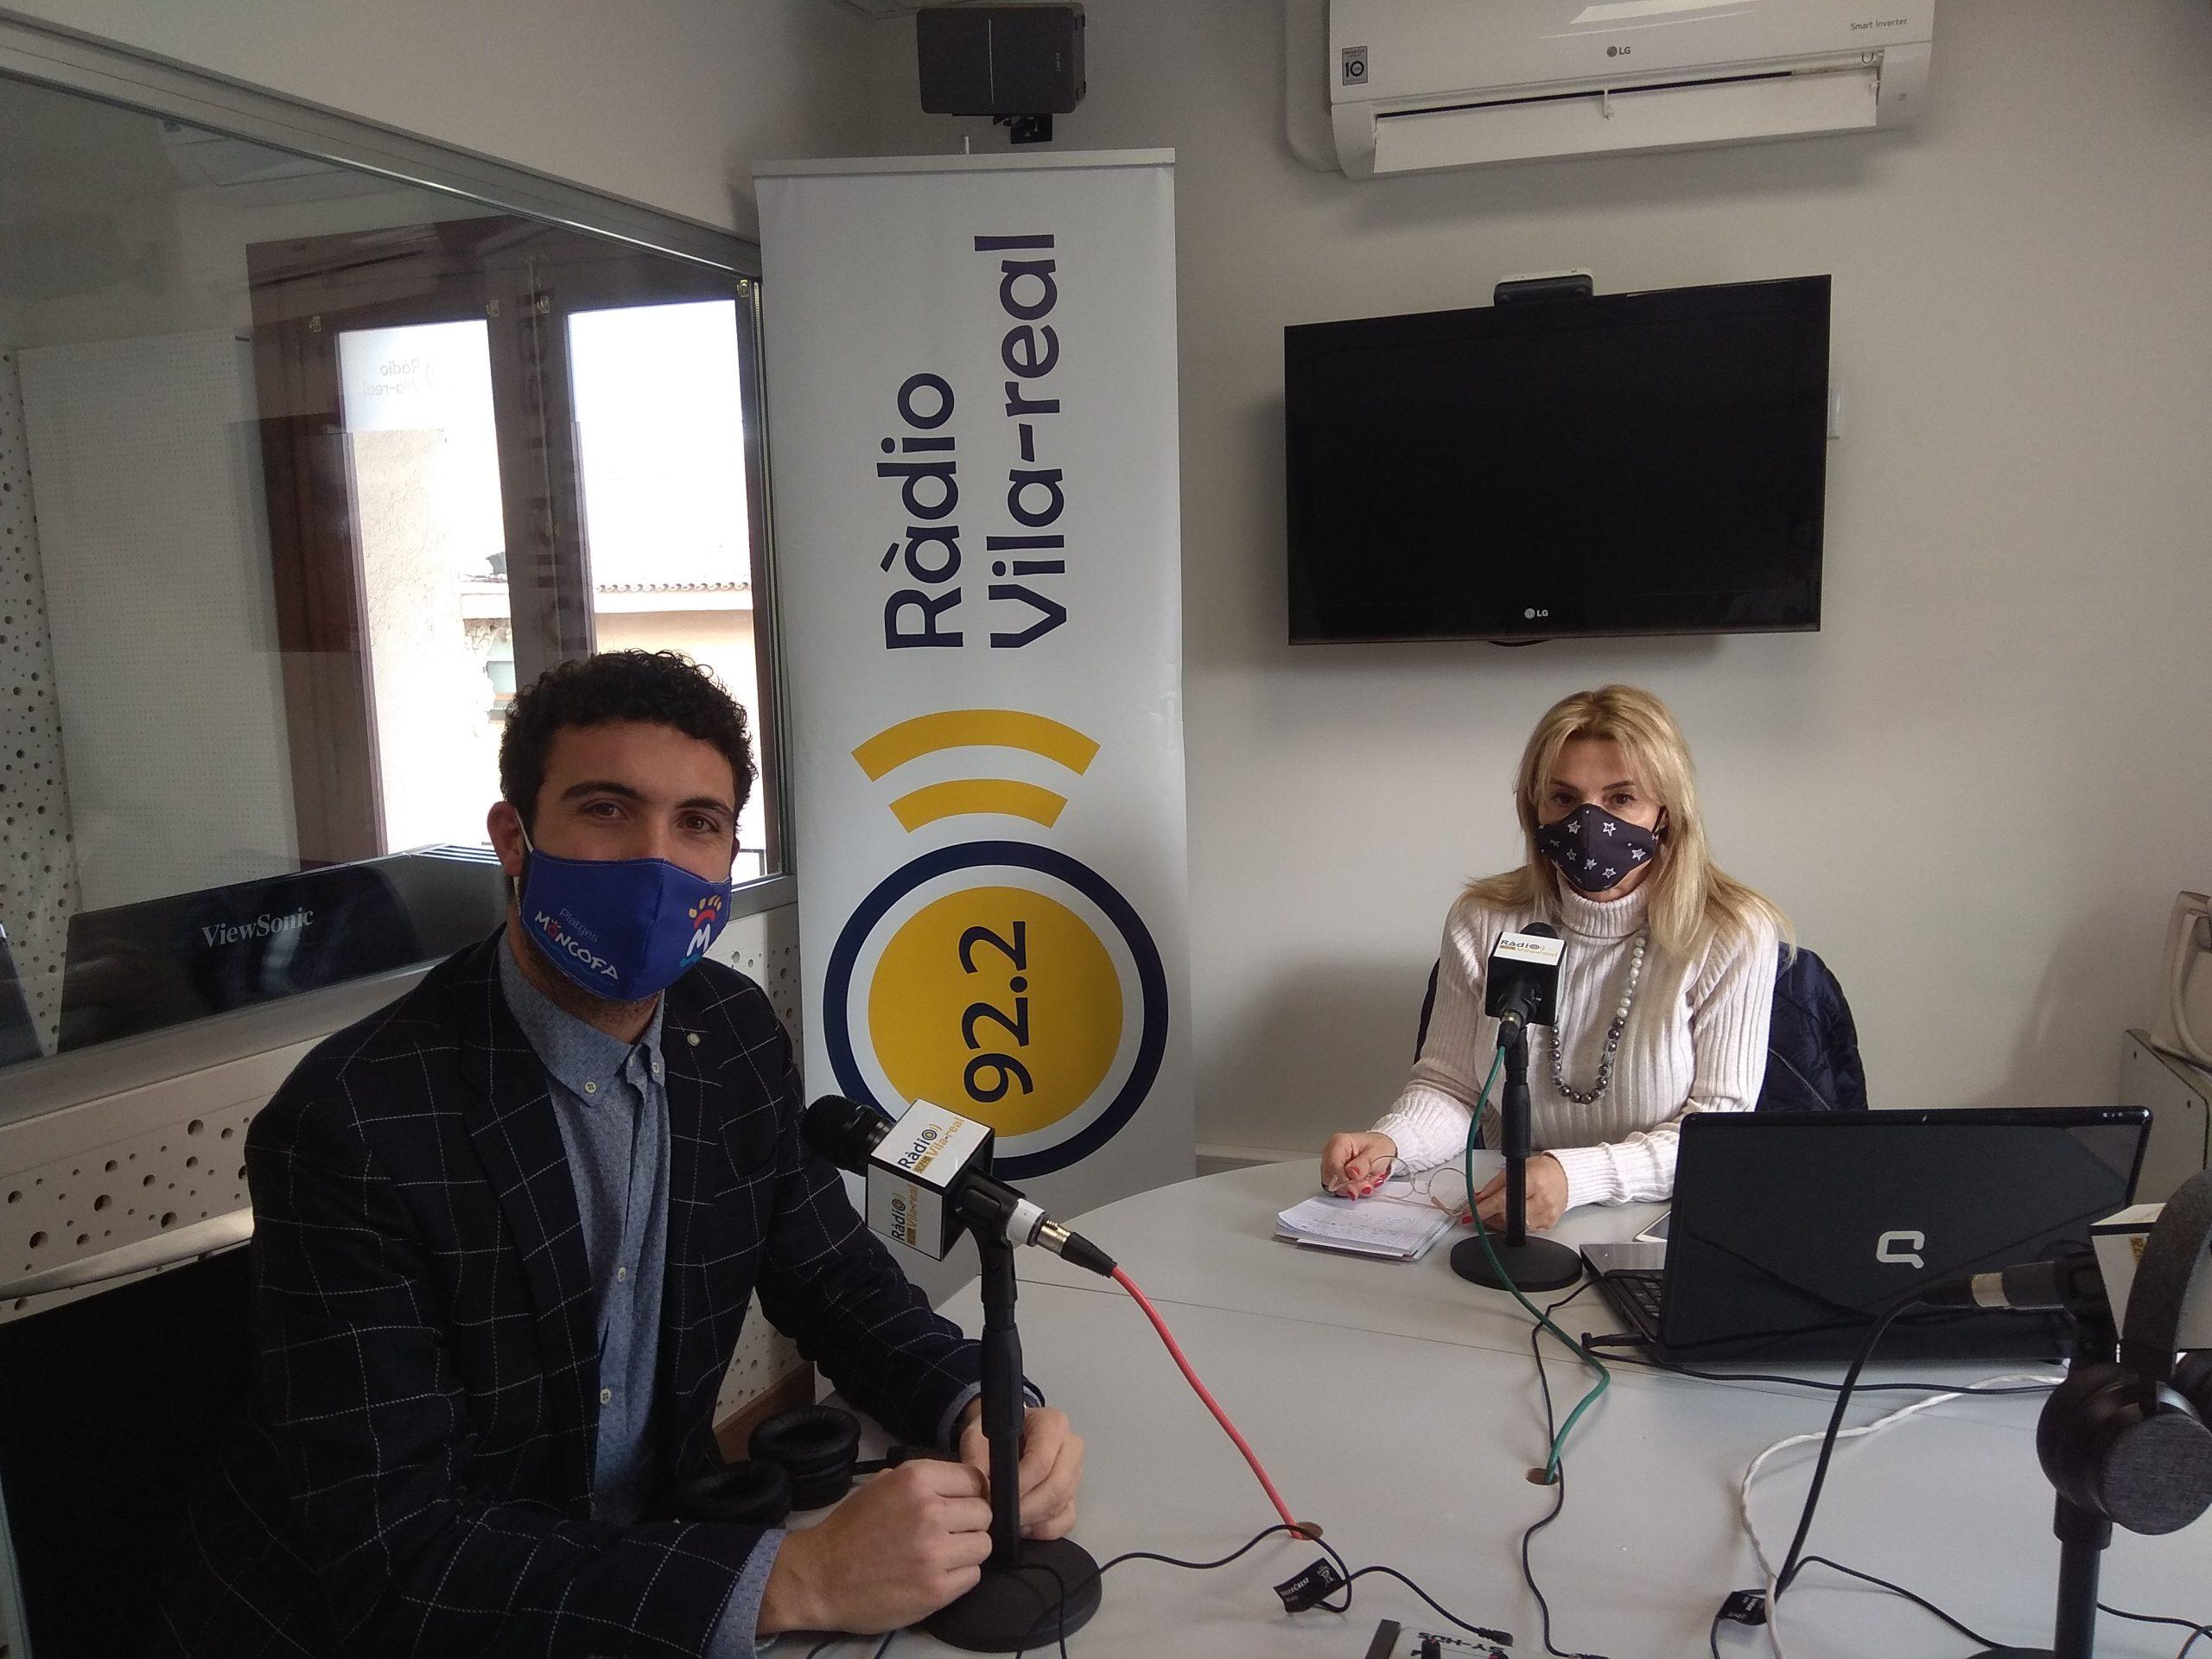 Entrevista al portavoz de Podem en Moncofa, Rafa Segarra